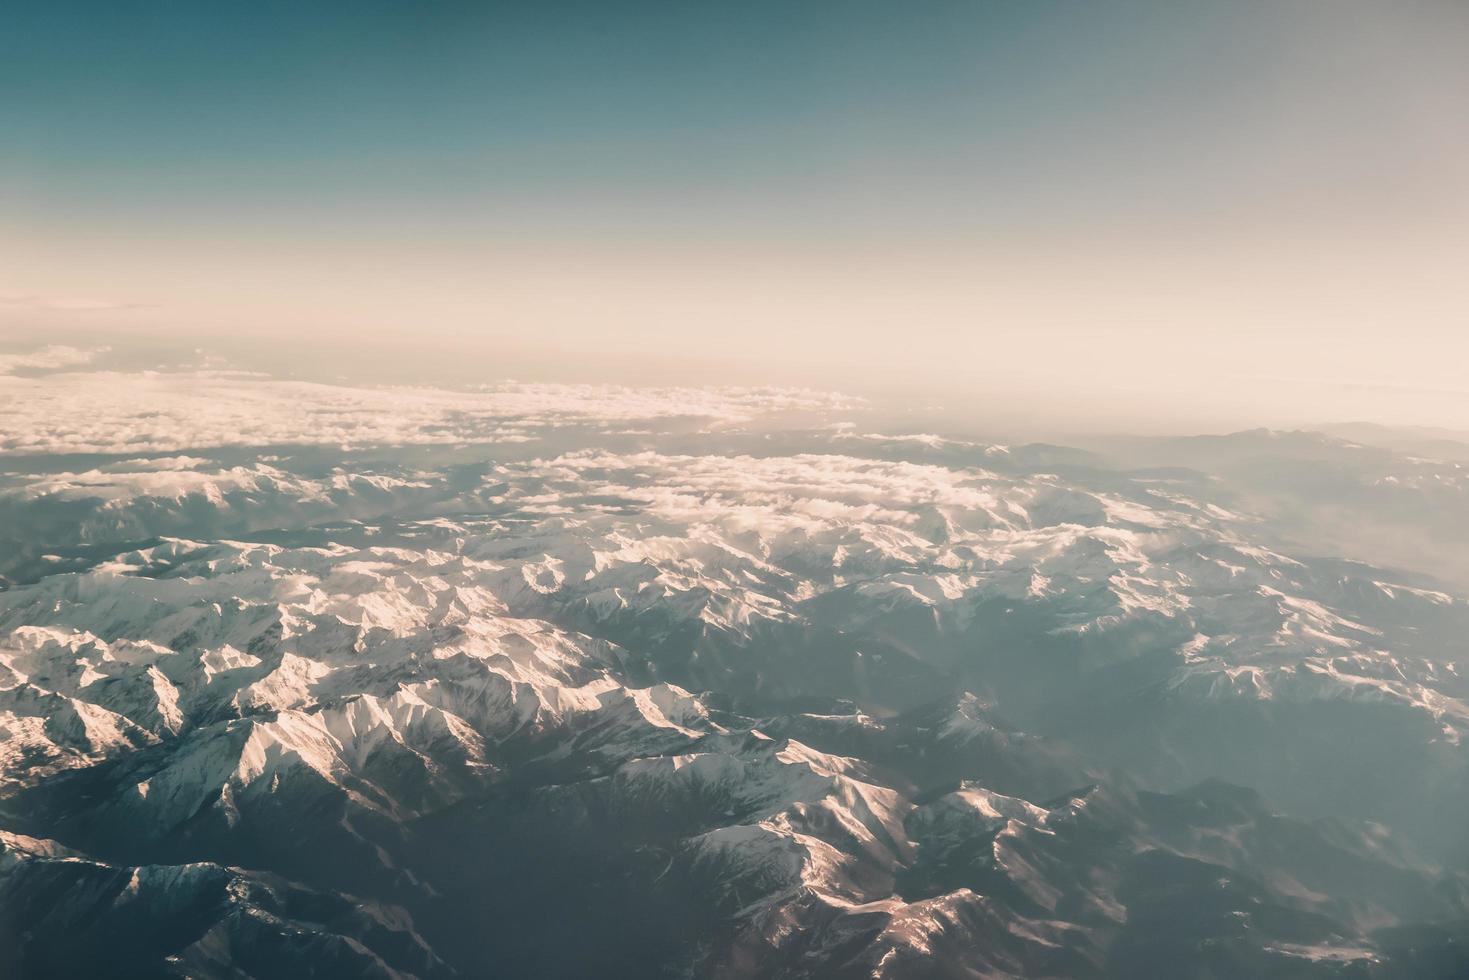 Gebirgslandschaft vom Flugzeug foto